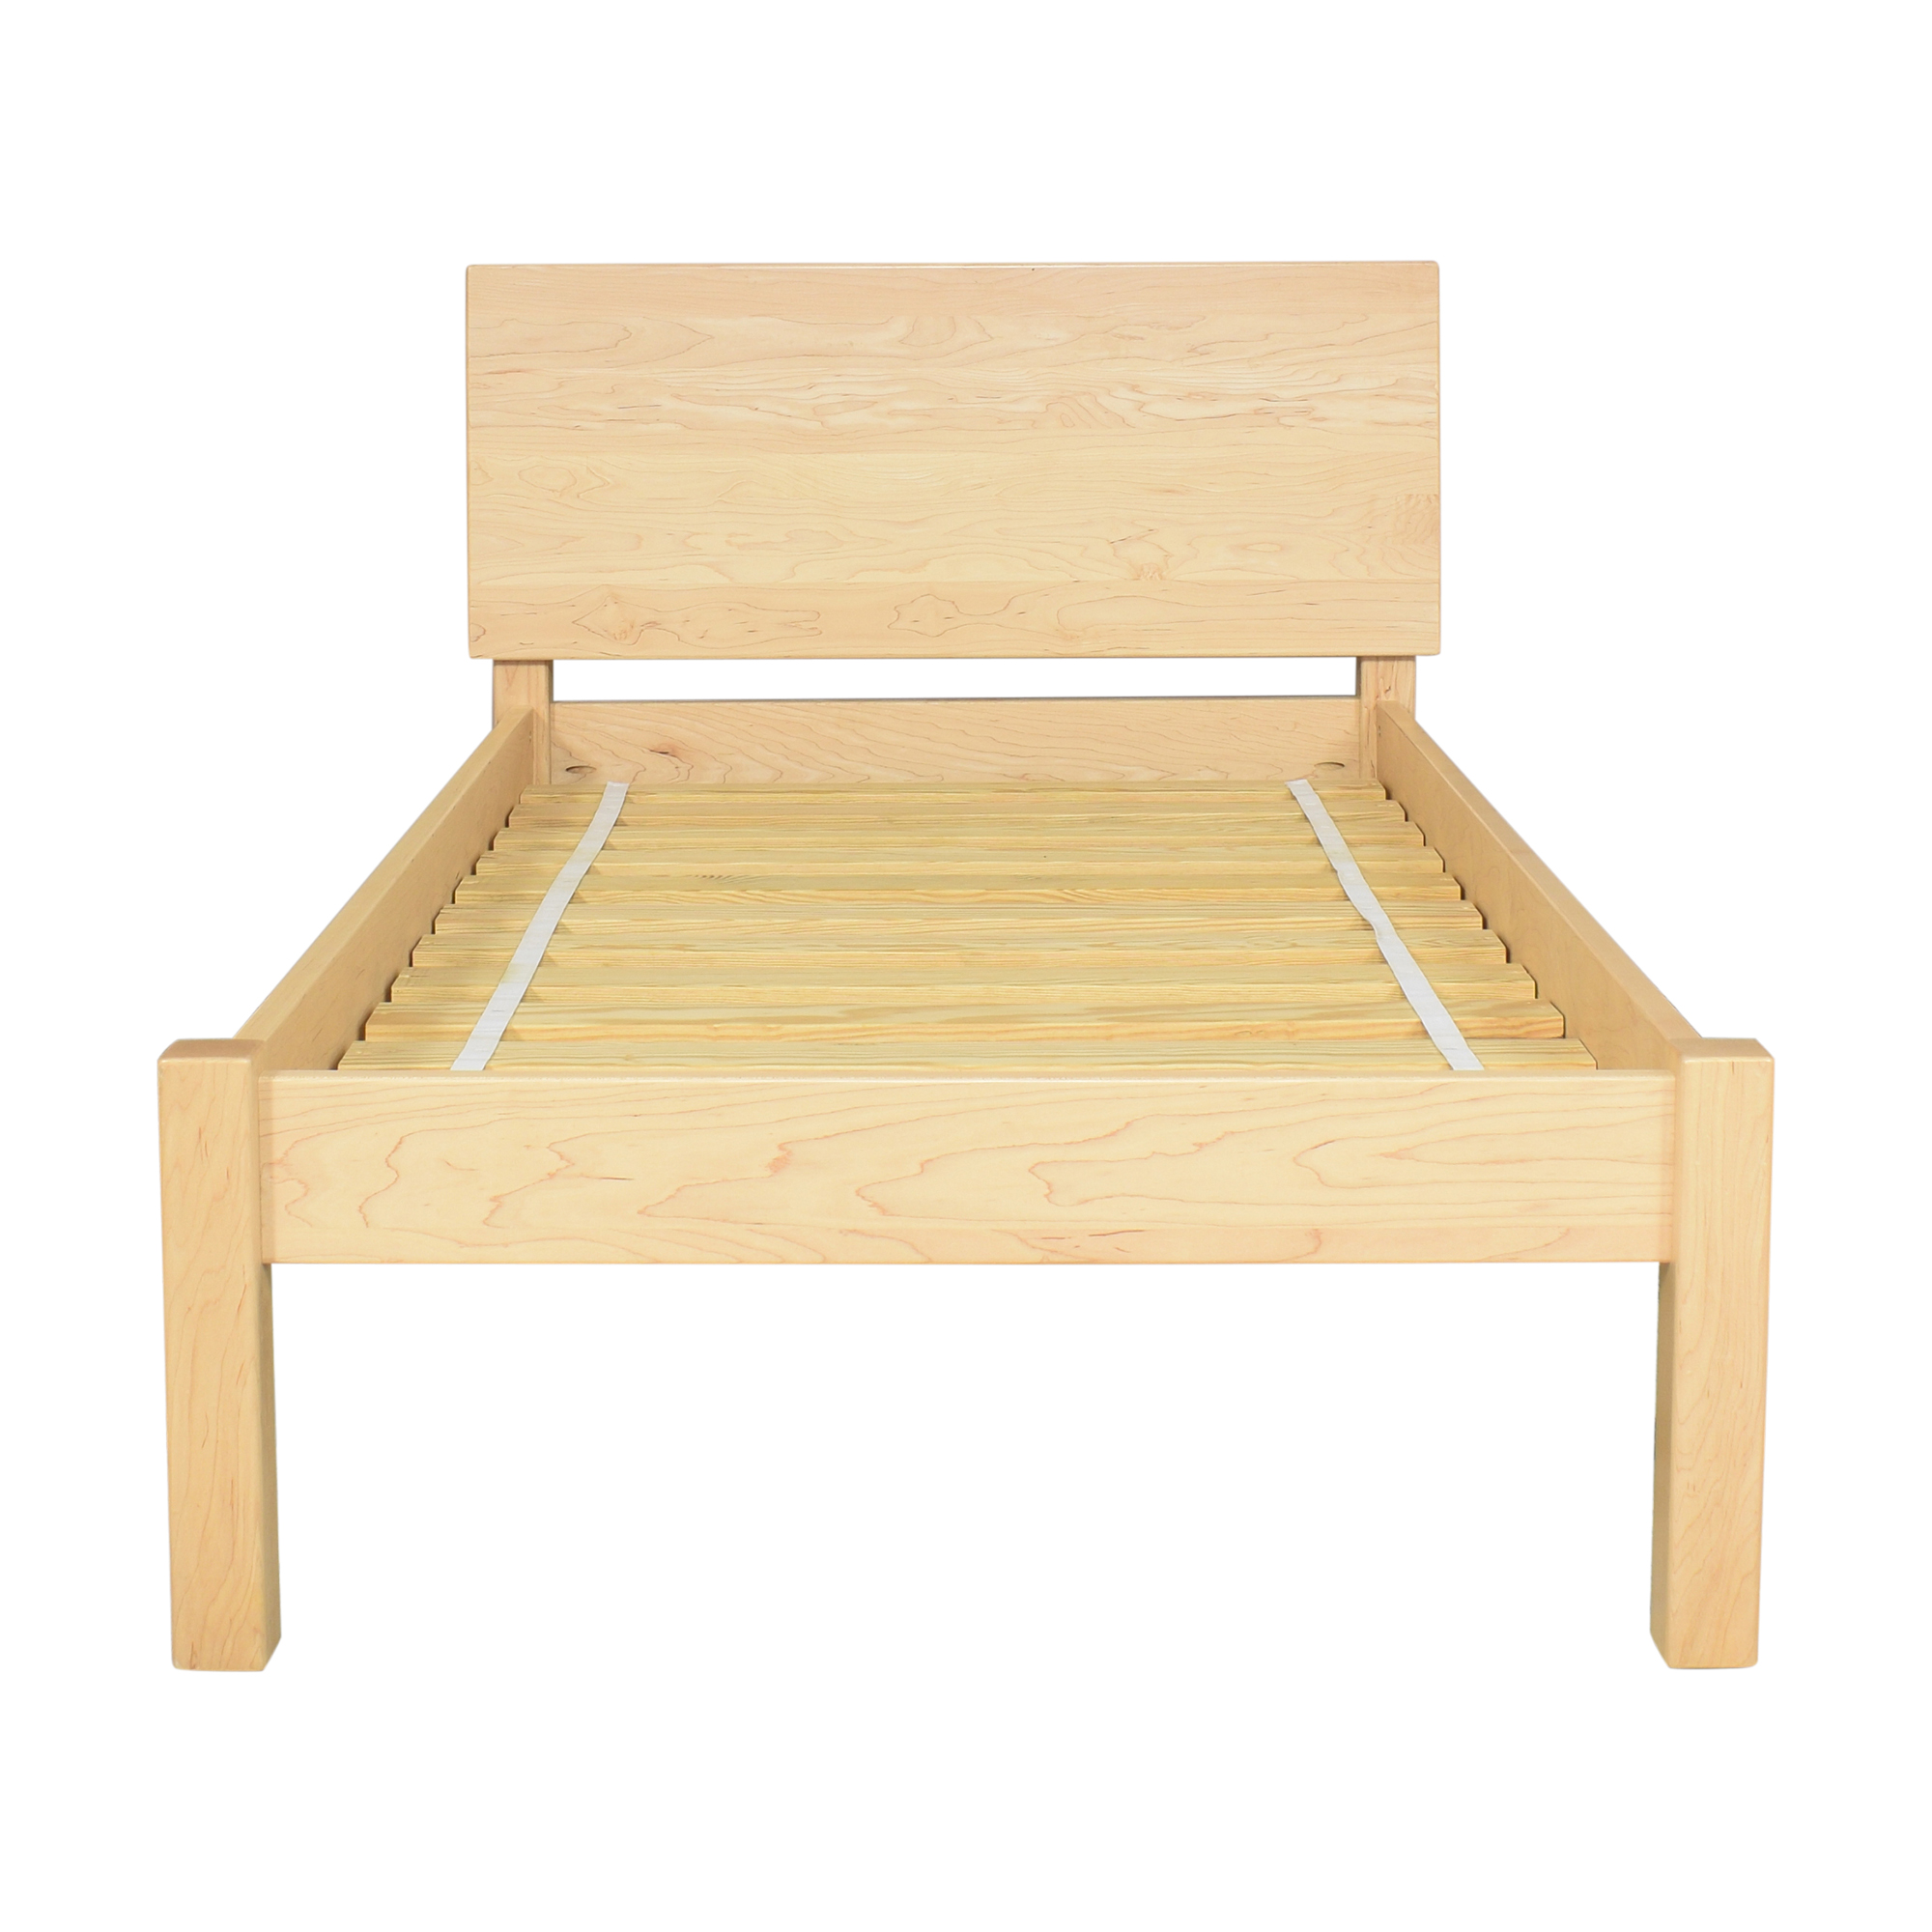 Room & Board Room & Board Pogo Twin Bed for sale